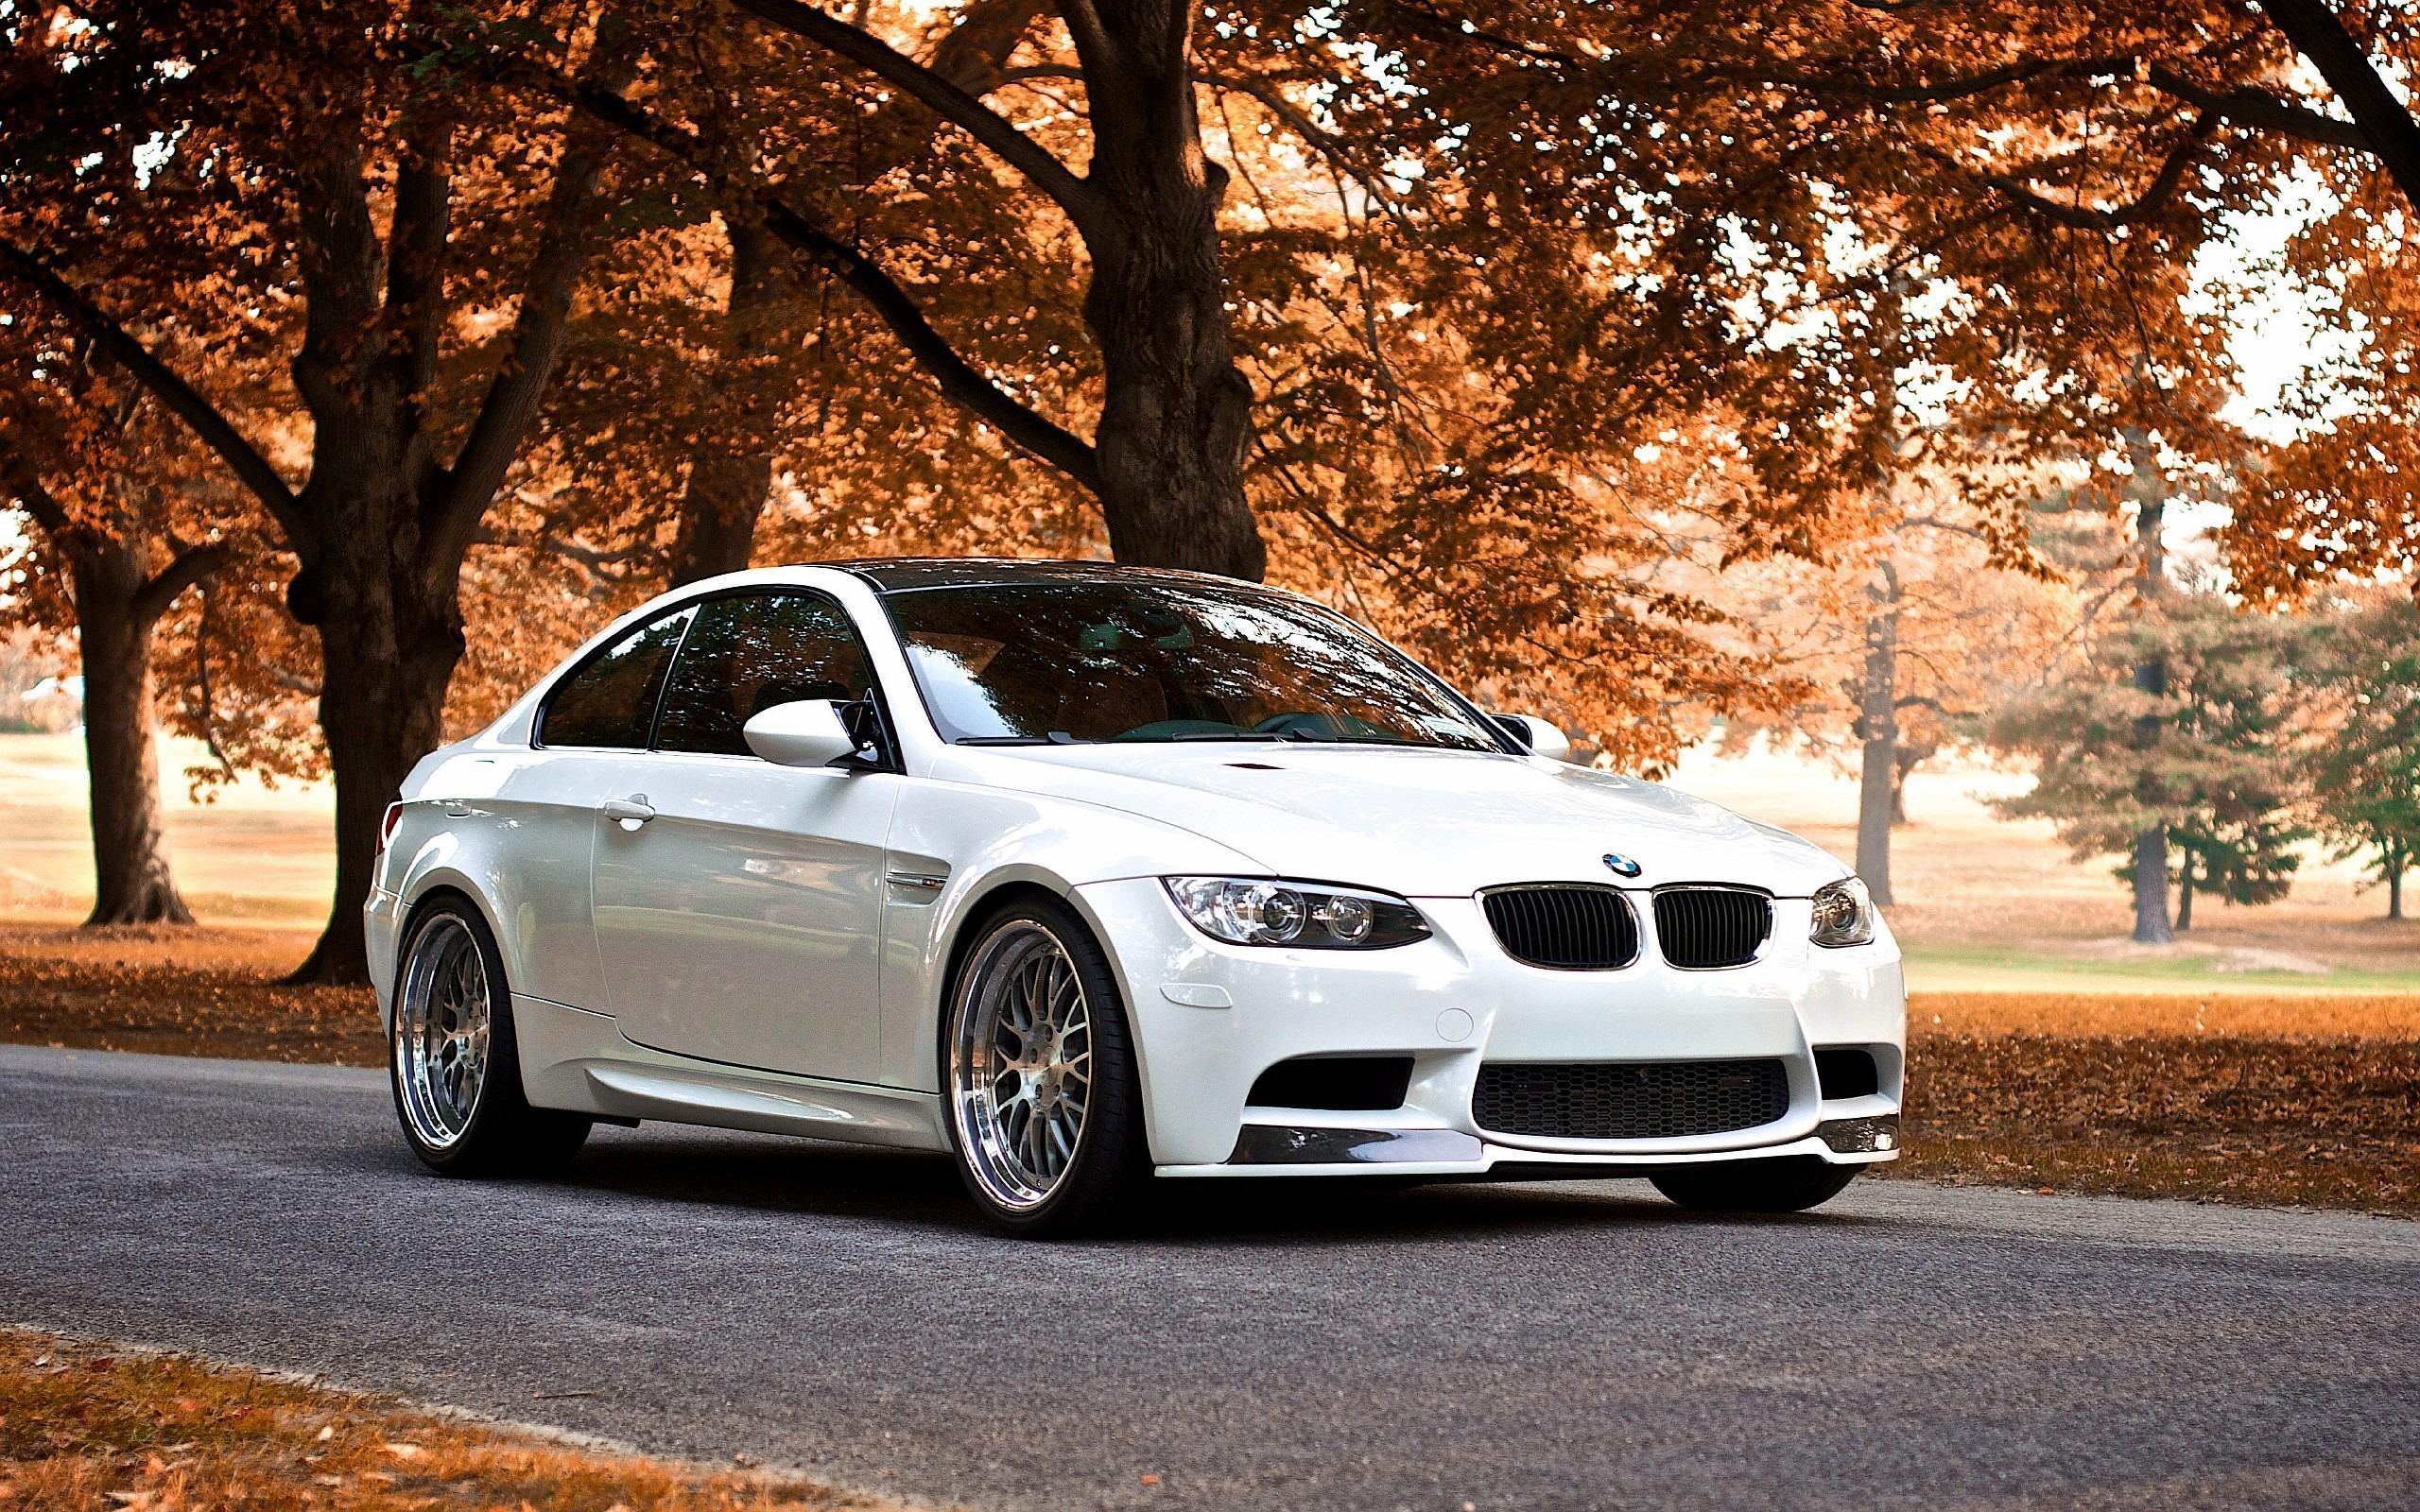 BMW M6 дорога осень  № 2445242 бесплатно